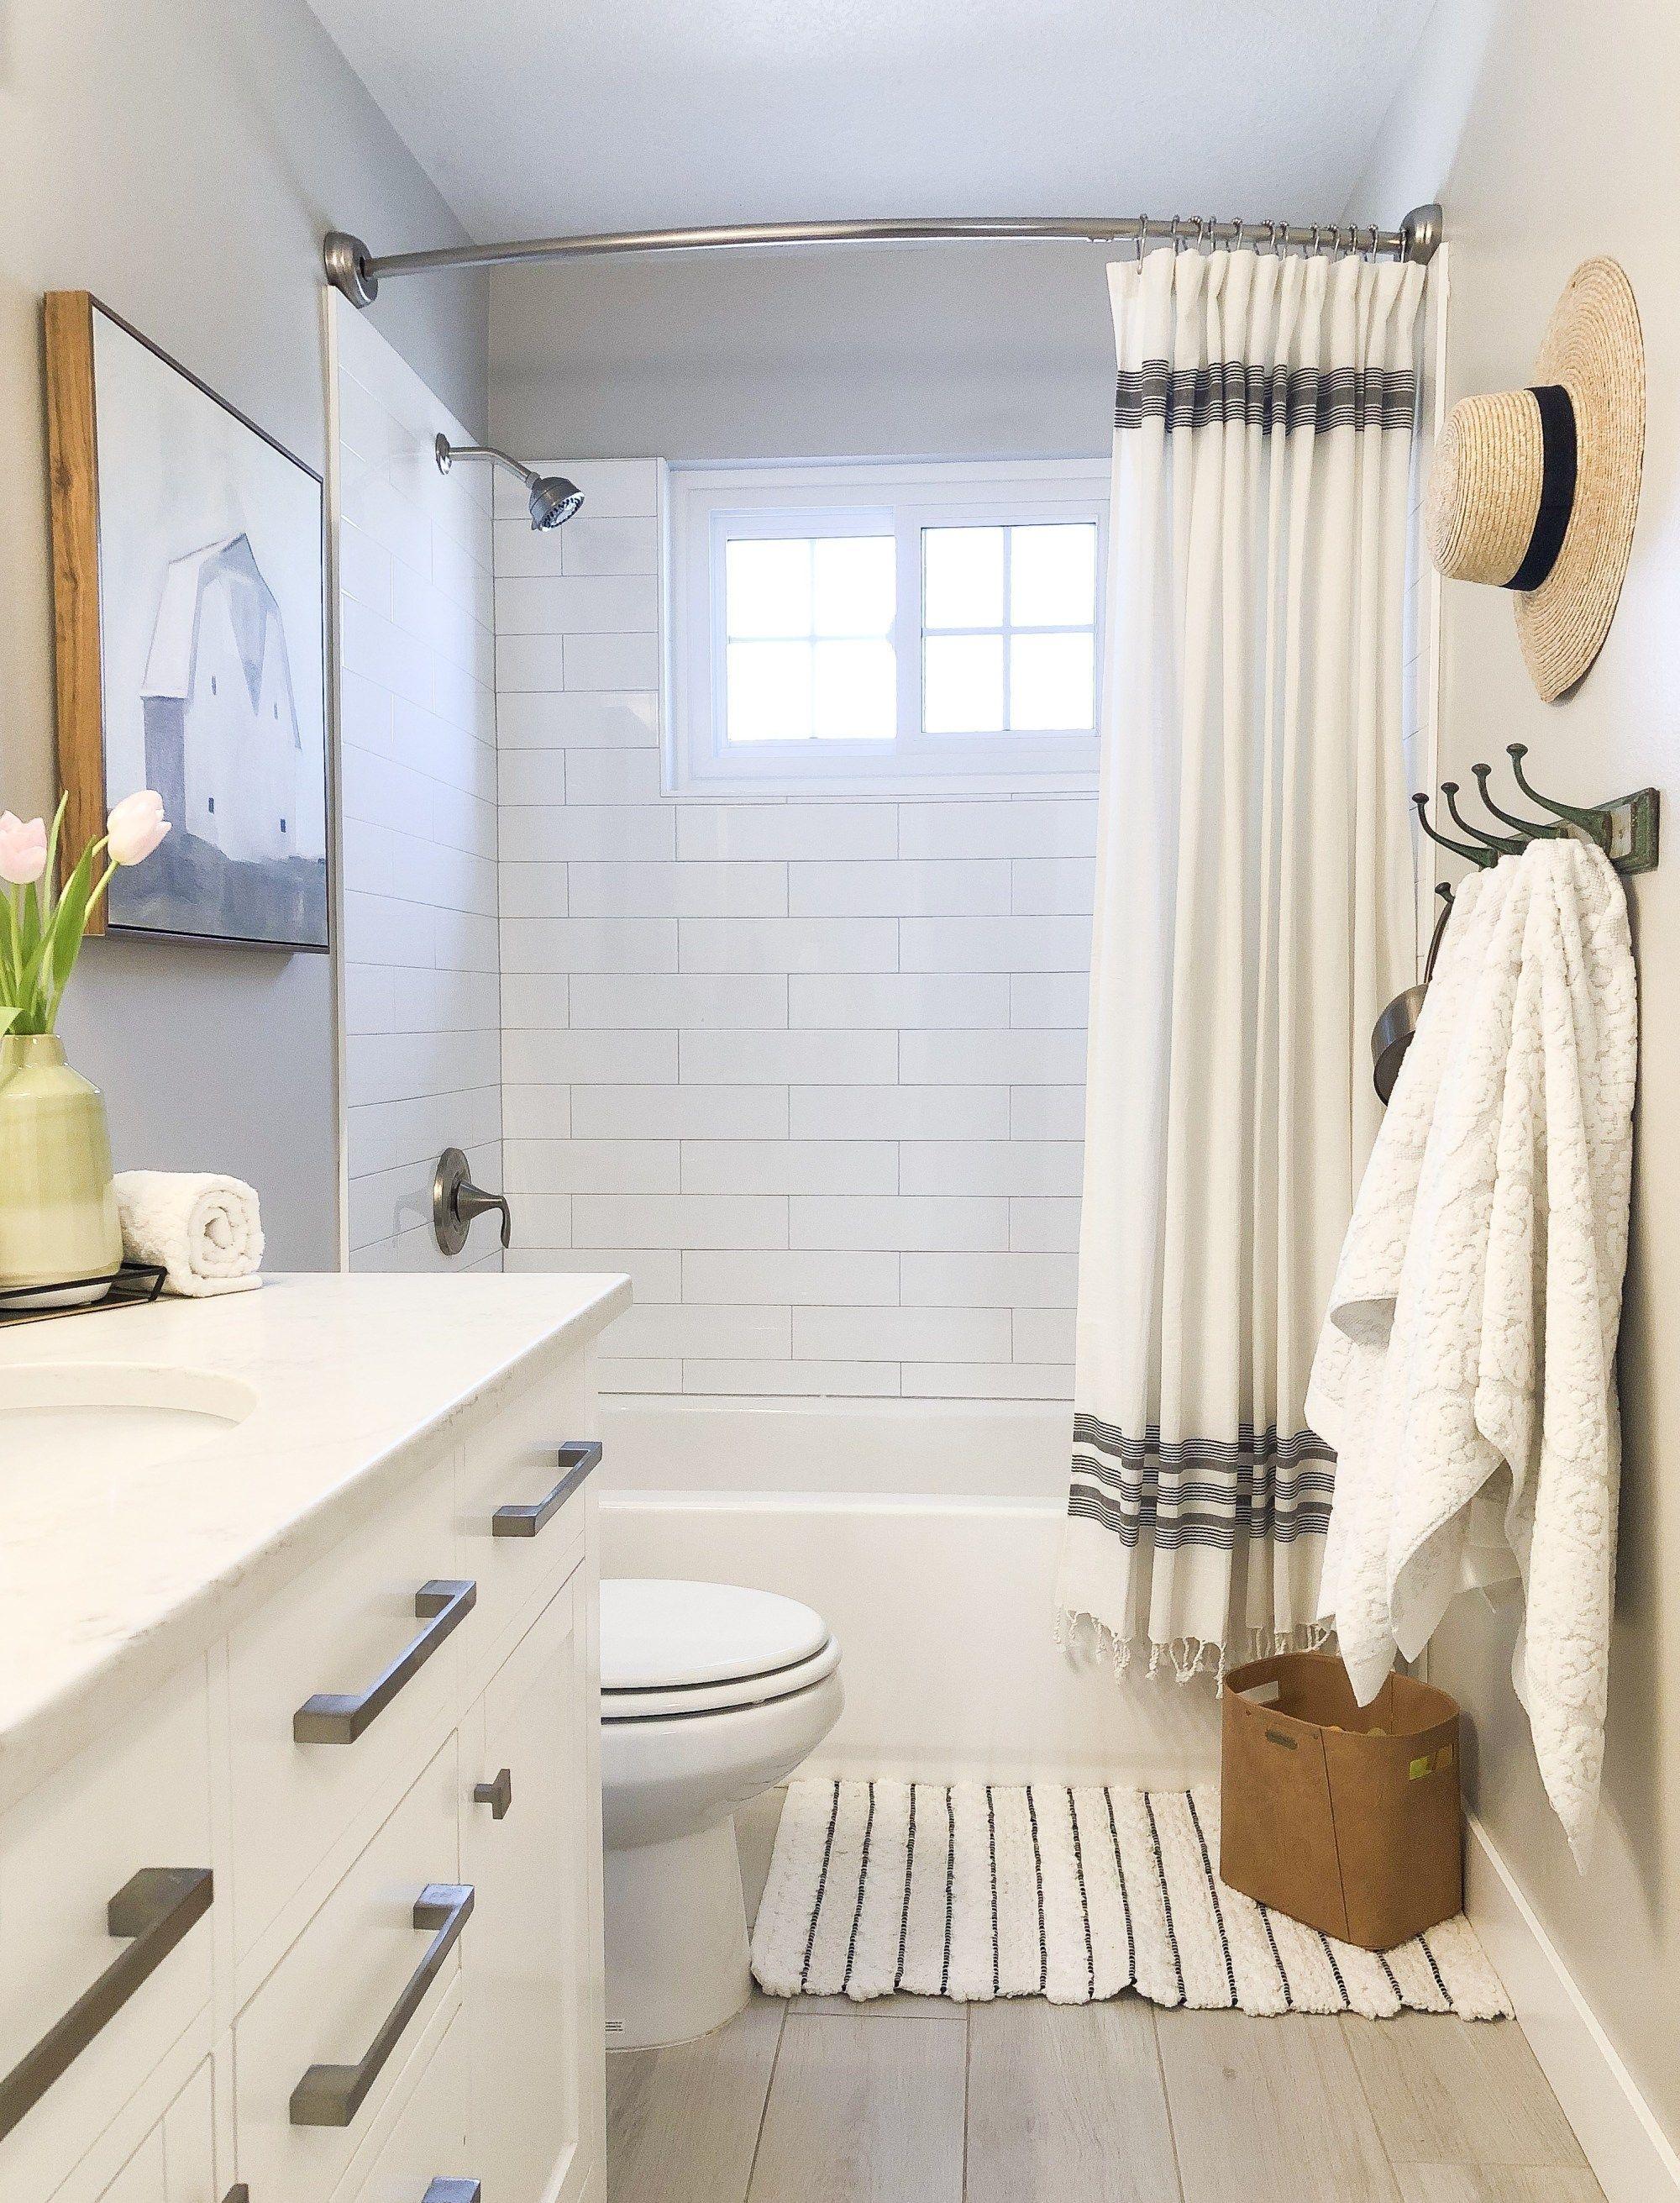 Rustic Bathroom Small Bathroom Decor Magnolia Bathroom Hearth And Hand